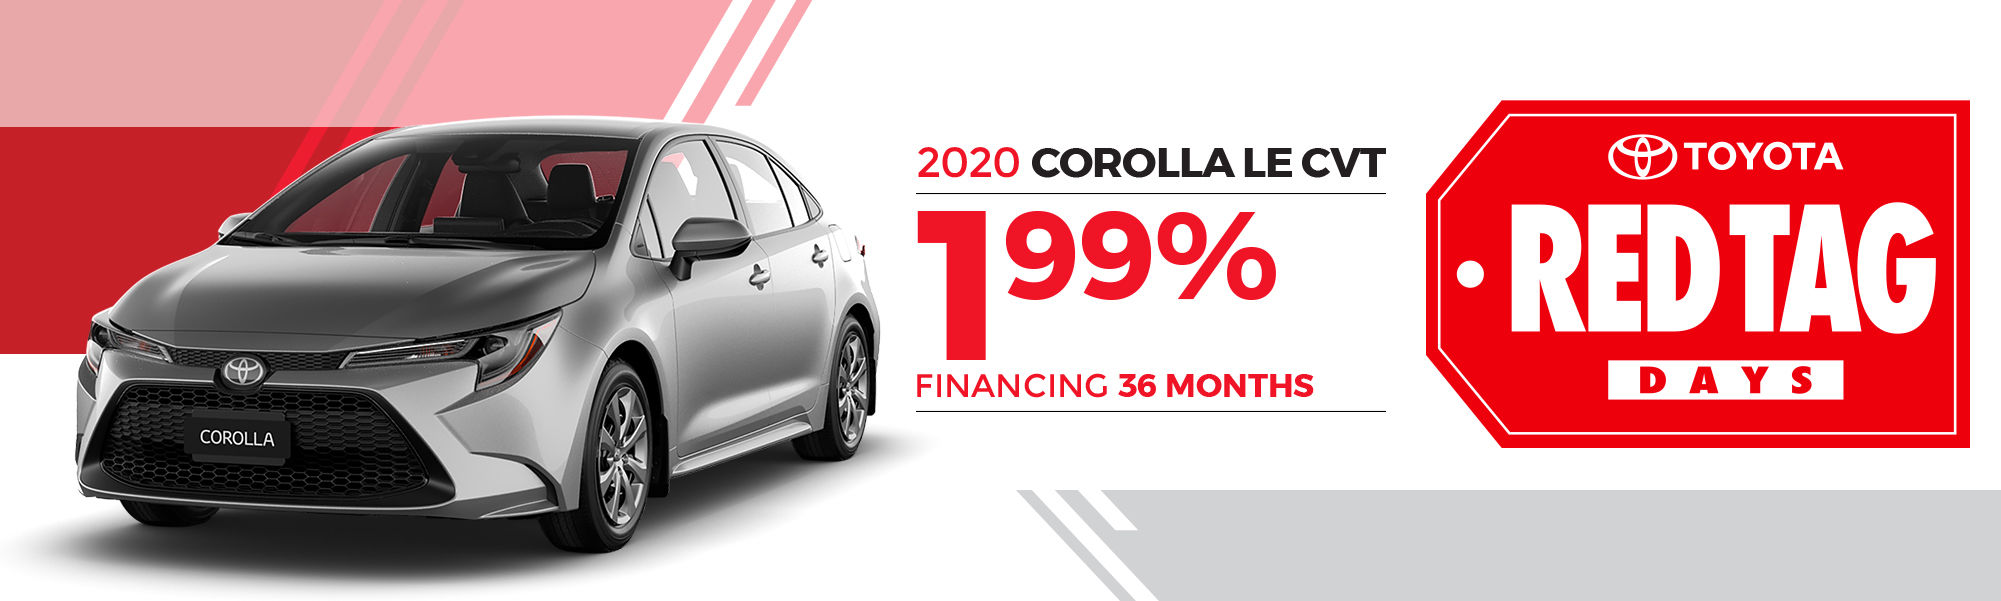 2020 COROLLA LE CVT